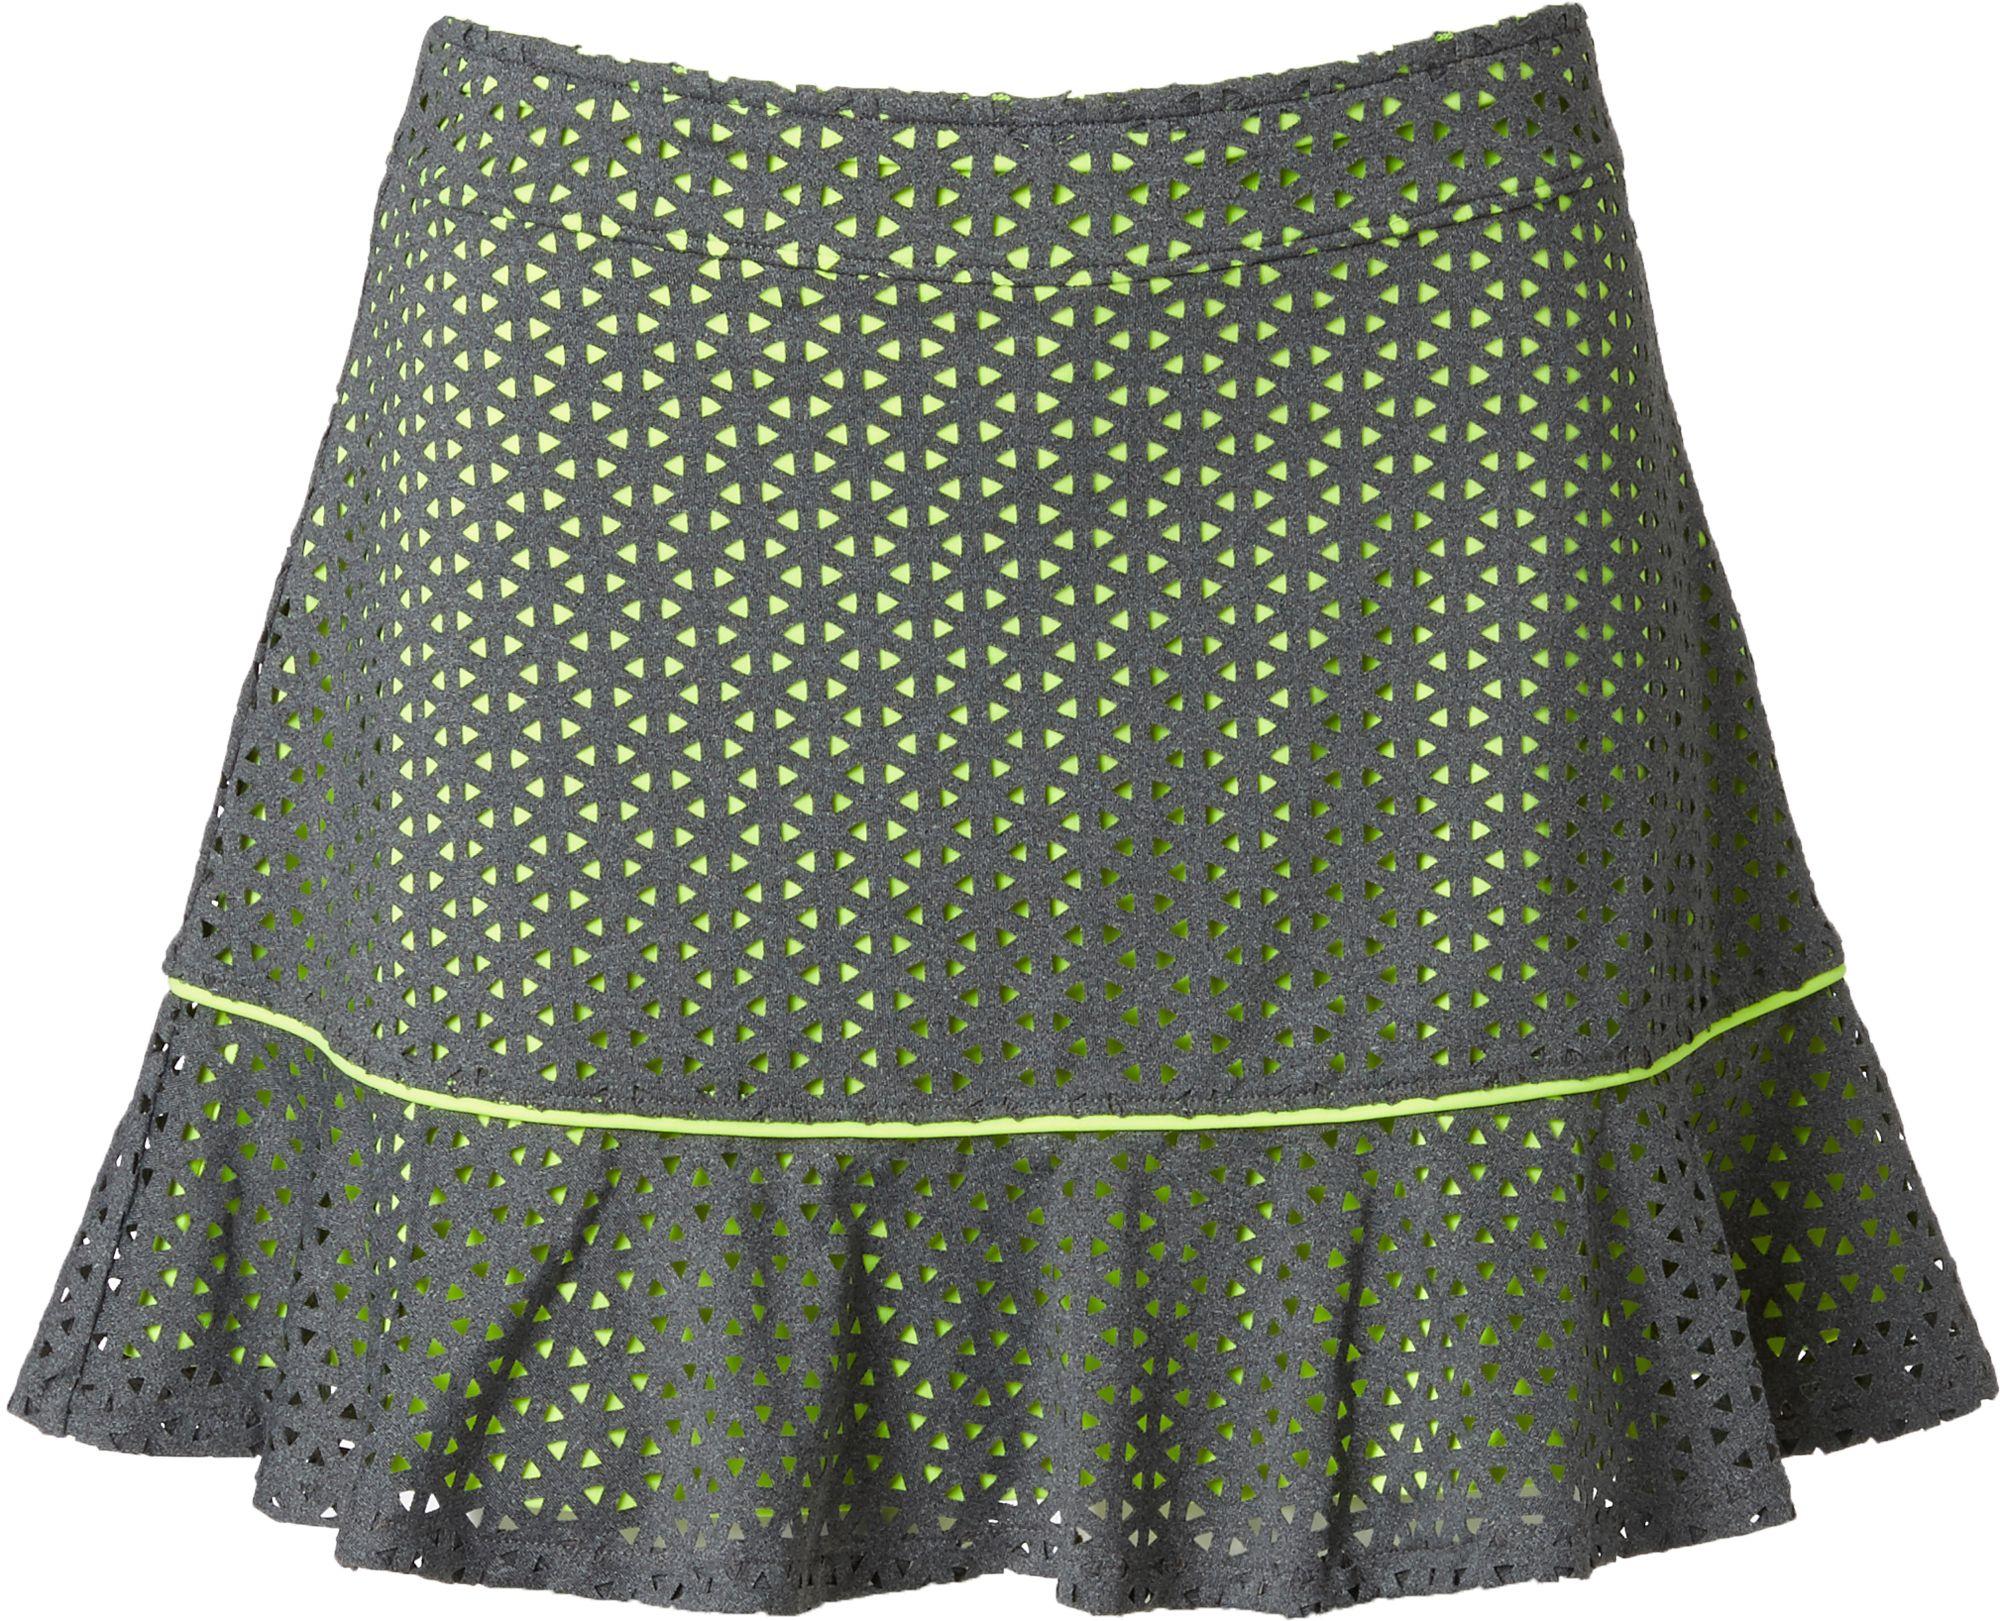 Slazenger Girls Layered Perforated Ruffle Knit Golf Skort DICKS Sporting Goods